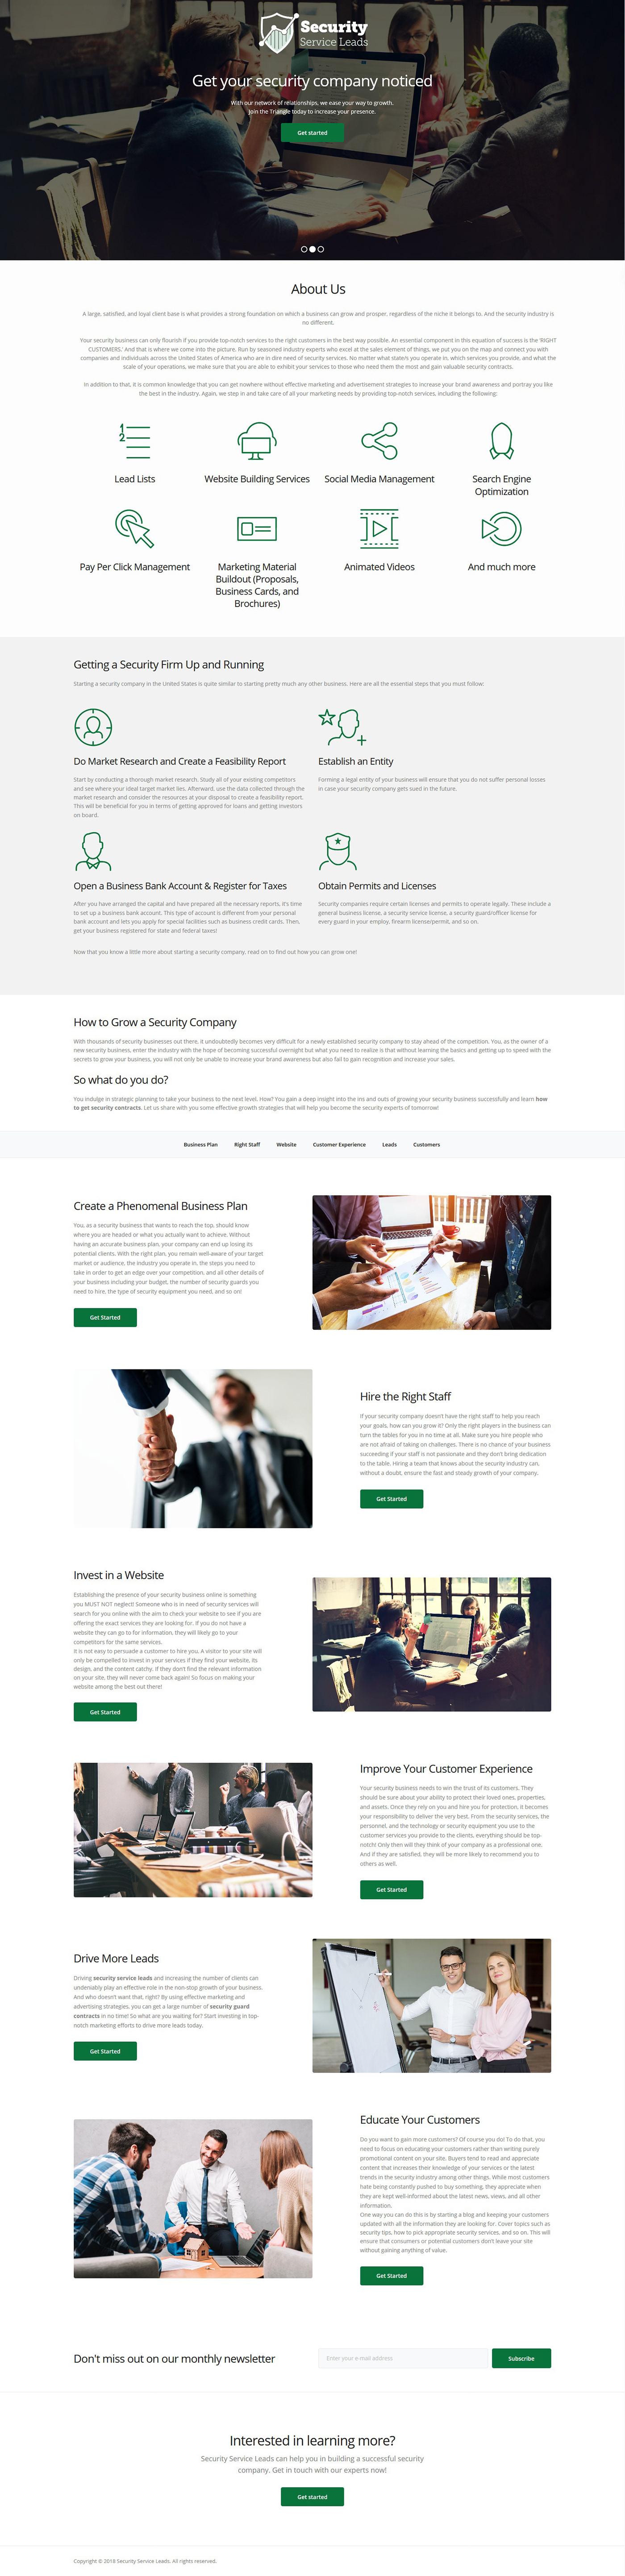 security provider template Lead Template Social Media Management SEO website template ui design